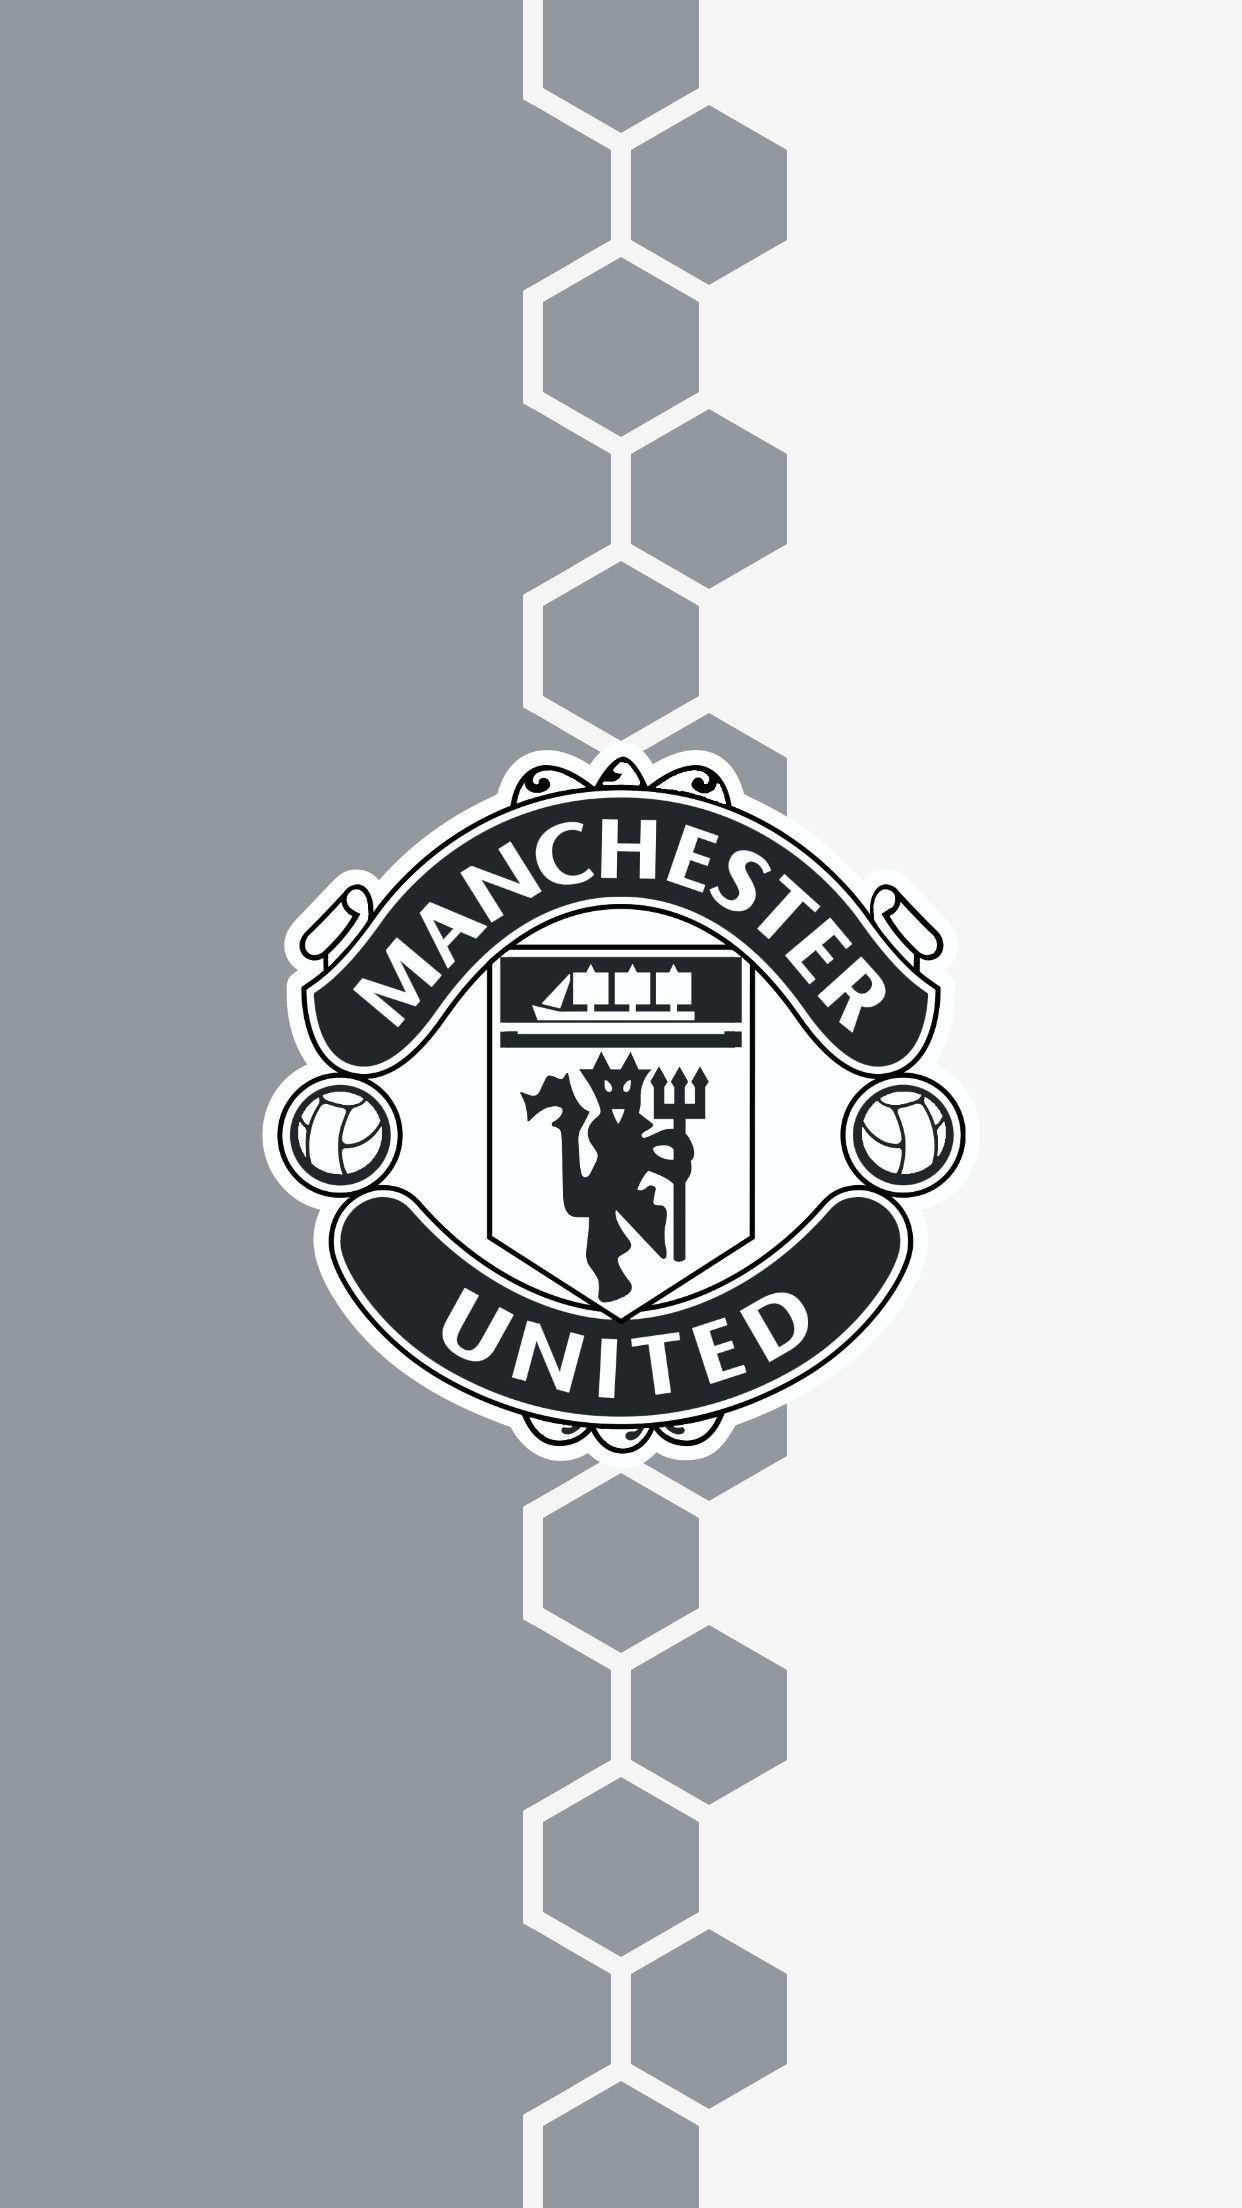 Manchester United Macbook Wallpaper Hd Football In 2020 Manchester United Logo Manchester United Wallpaper Manchester United Art